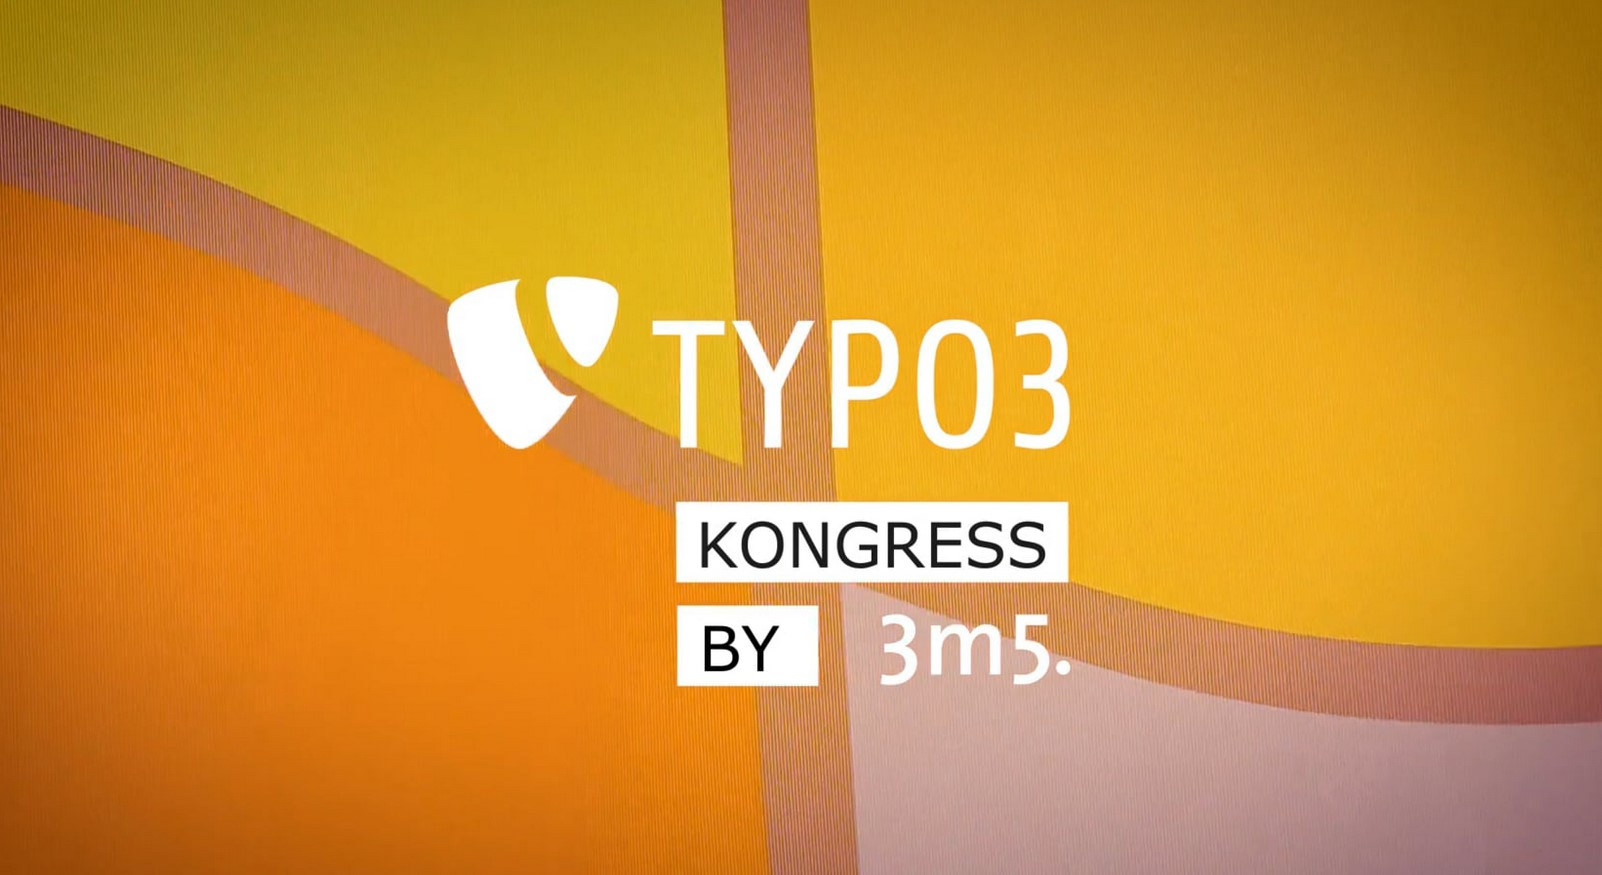 TYPO3 Kongress